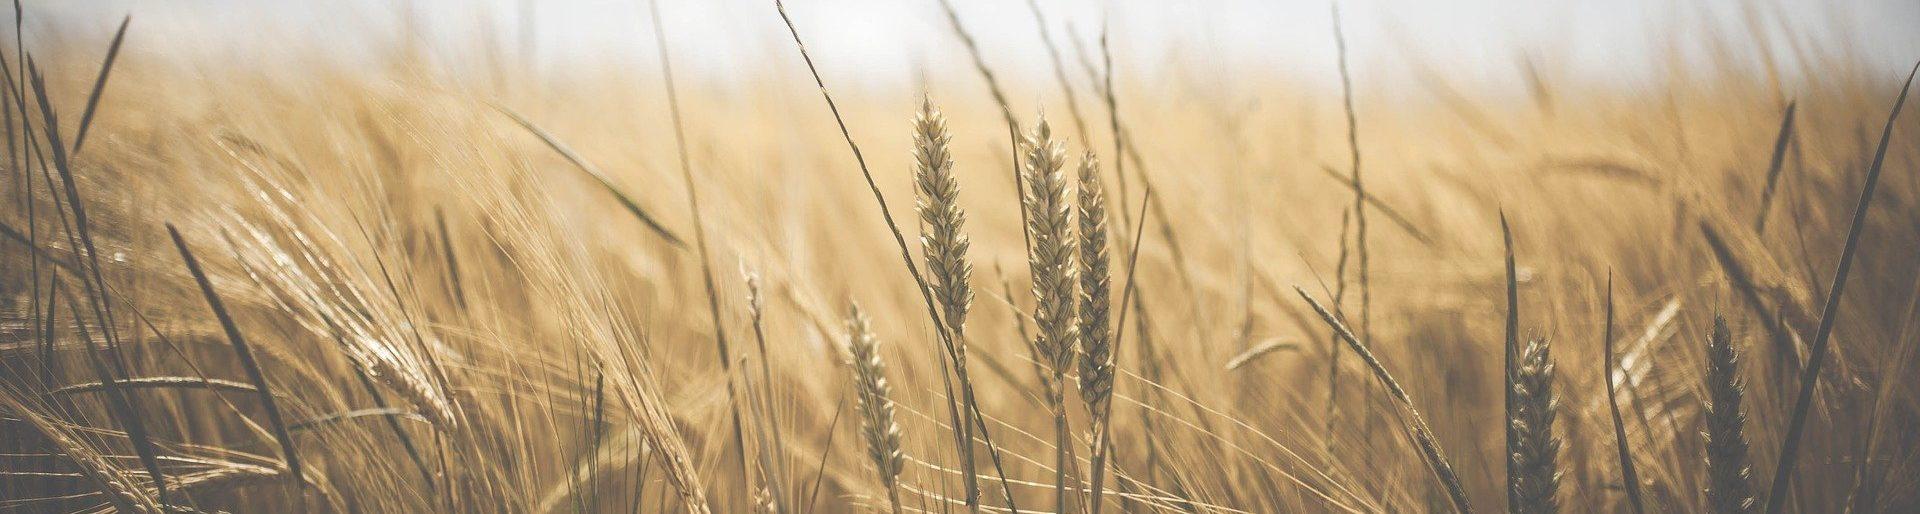 Agtech Foodtech Agrifoodtech agrifood innovation technology